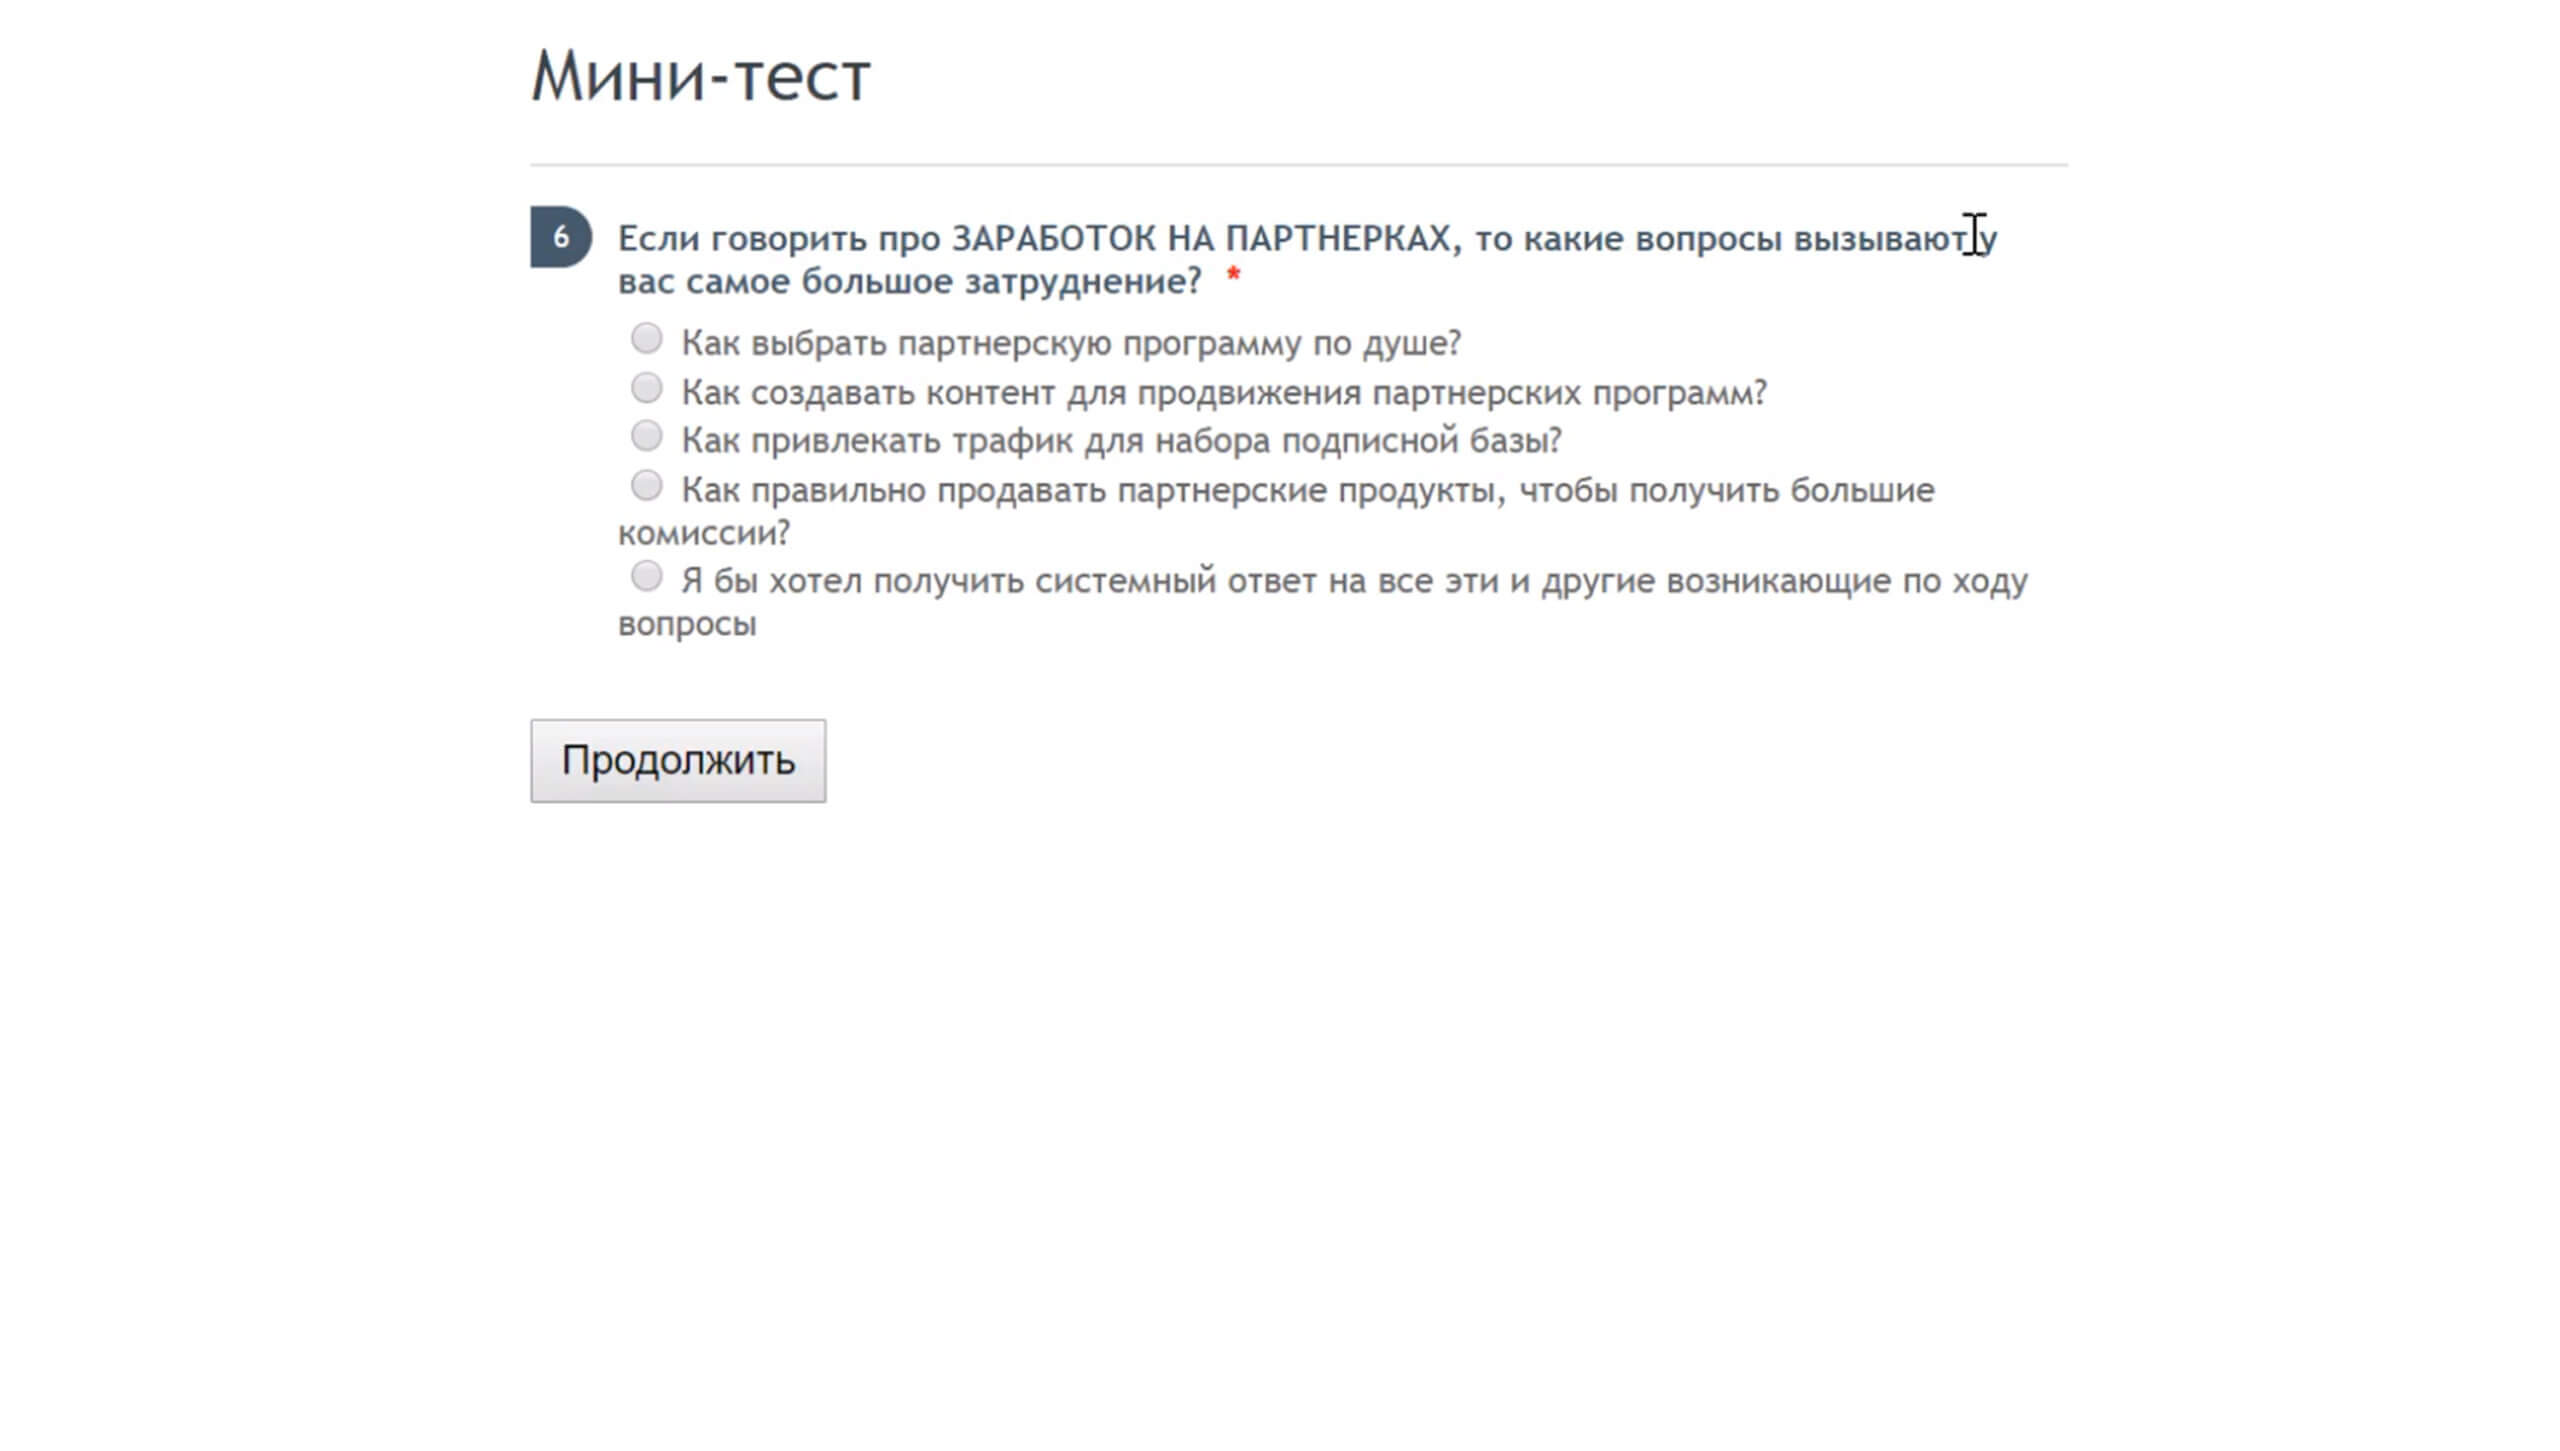 сайт квиз конструктор